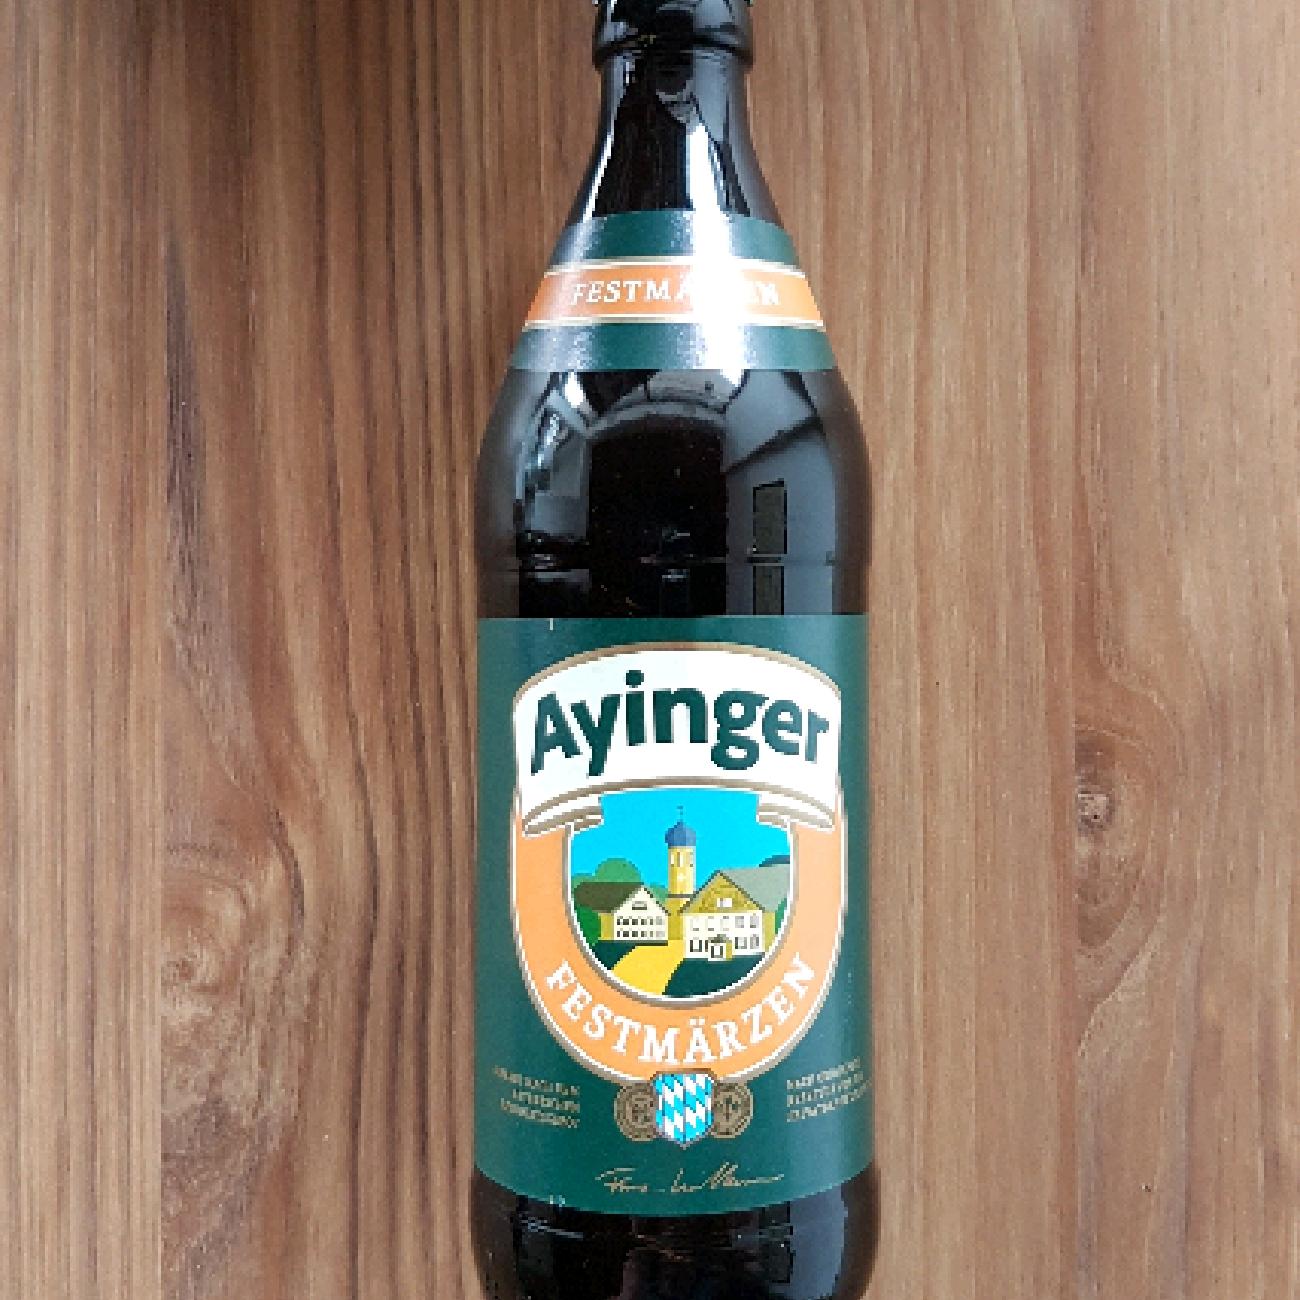 Ayinger Festmarzen